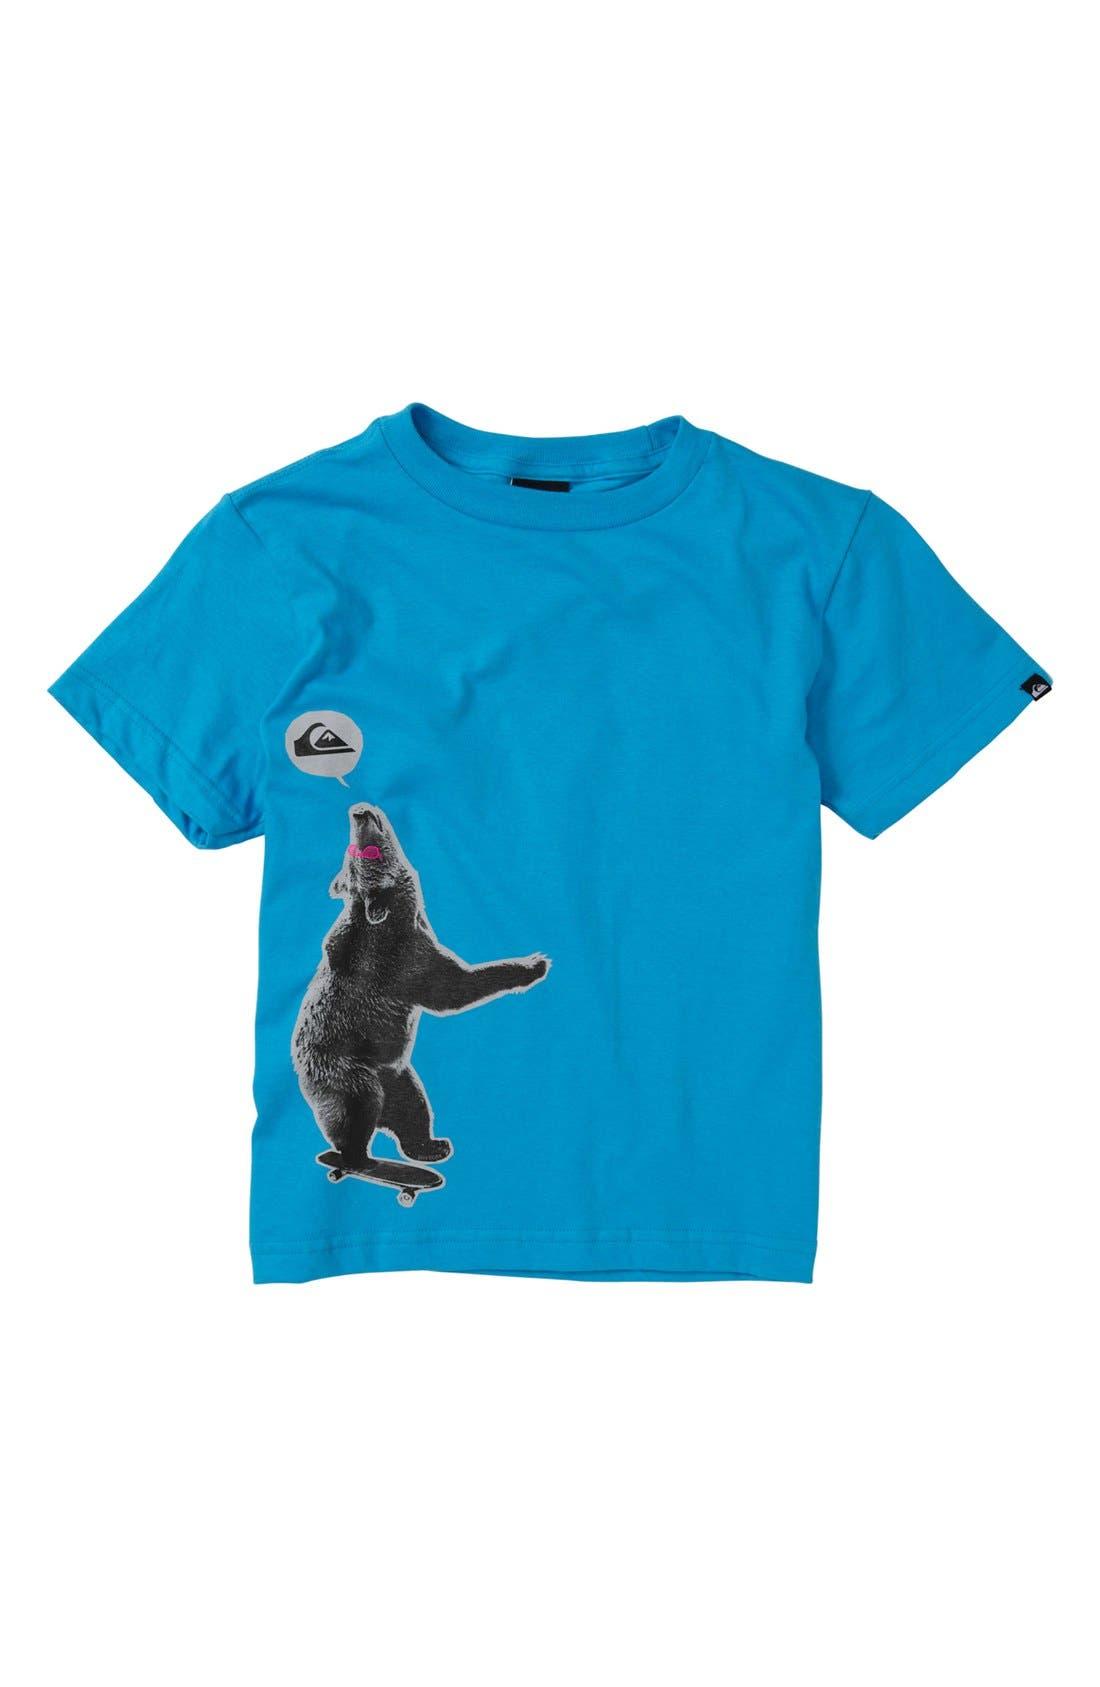 Main Image - Quiksilver 'Free Ride' T-Shirt (Baby Boys)